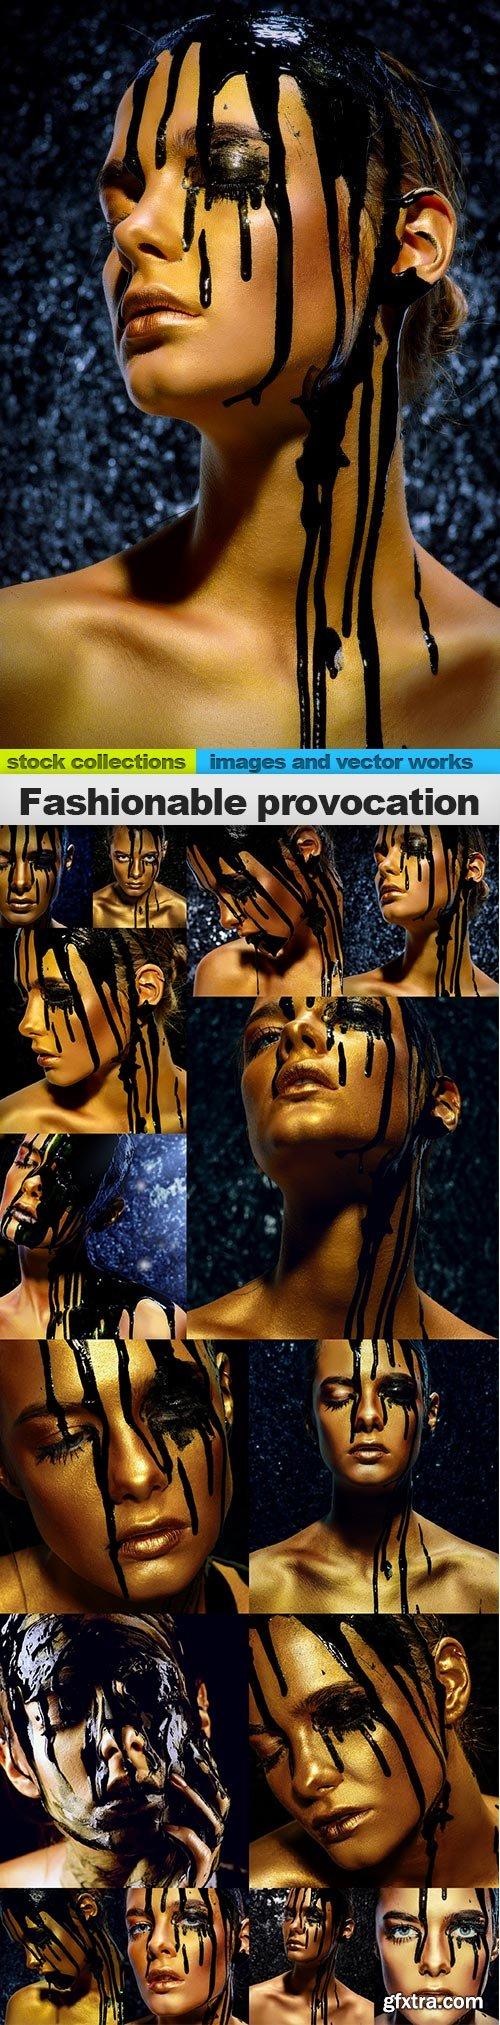 Fashionable provocation, 15 x UHQ JPEG